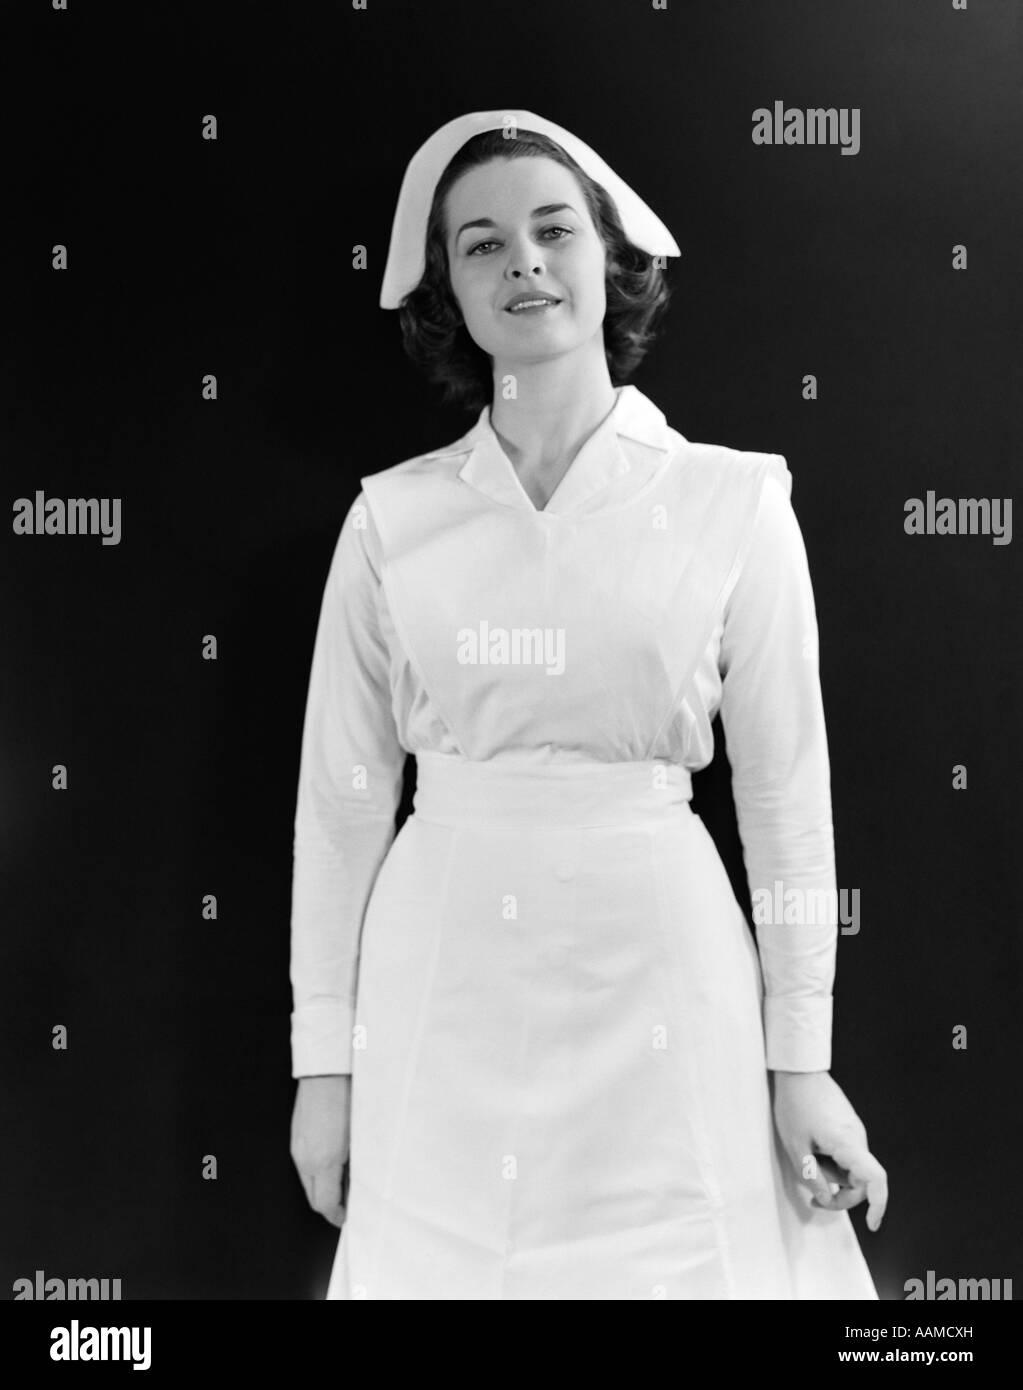 1950s 3 4 Length Portrait Smiling Brunette Nurse Stock